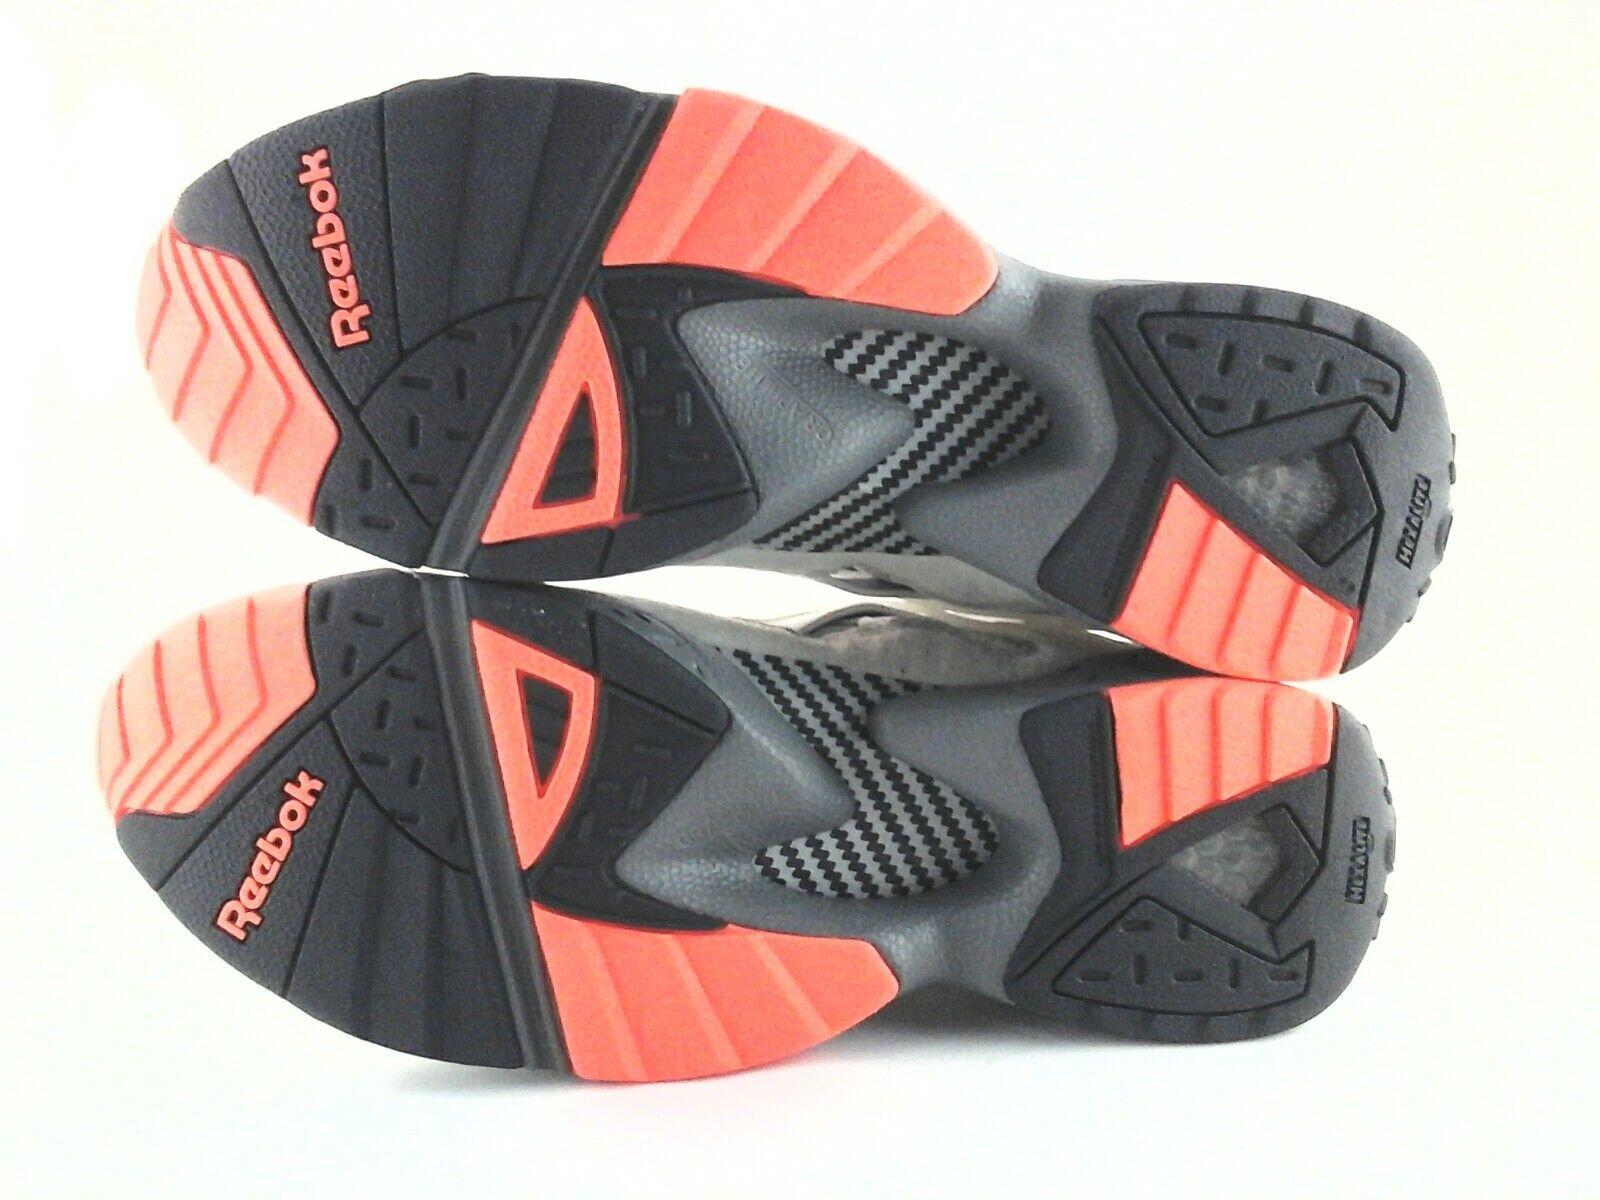 Reebok Graphlite Pro GID Mens BD3004 Running Shoes Grey Size 13M